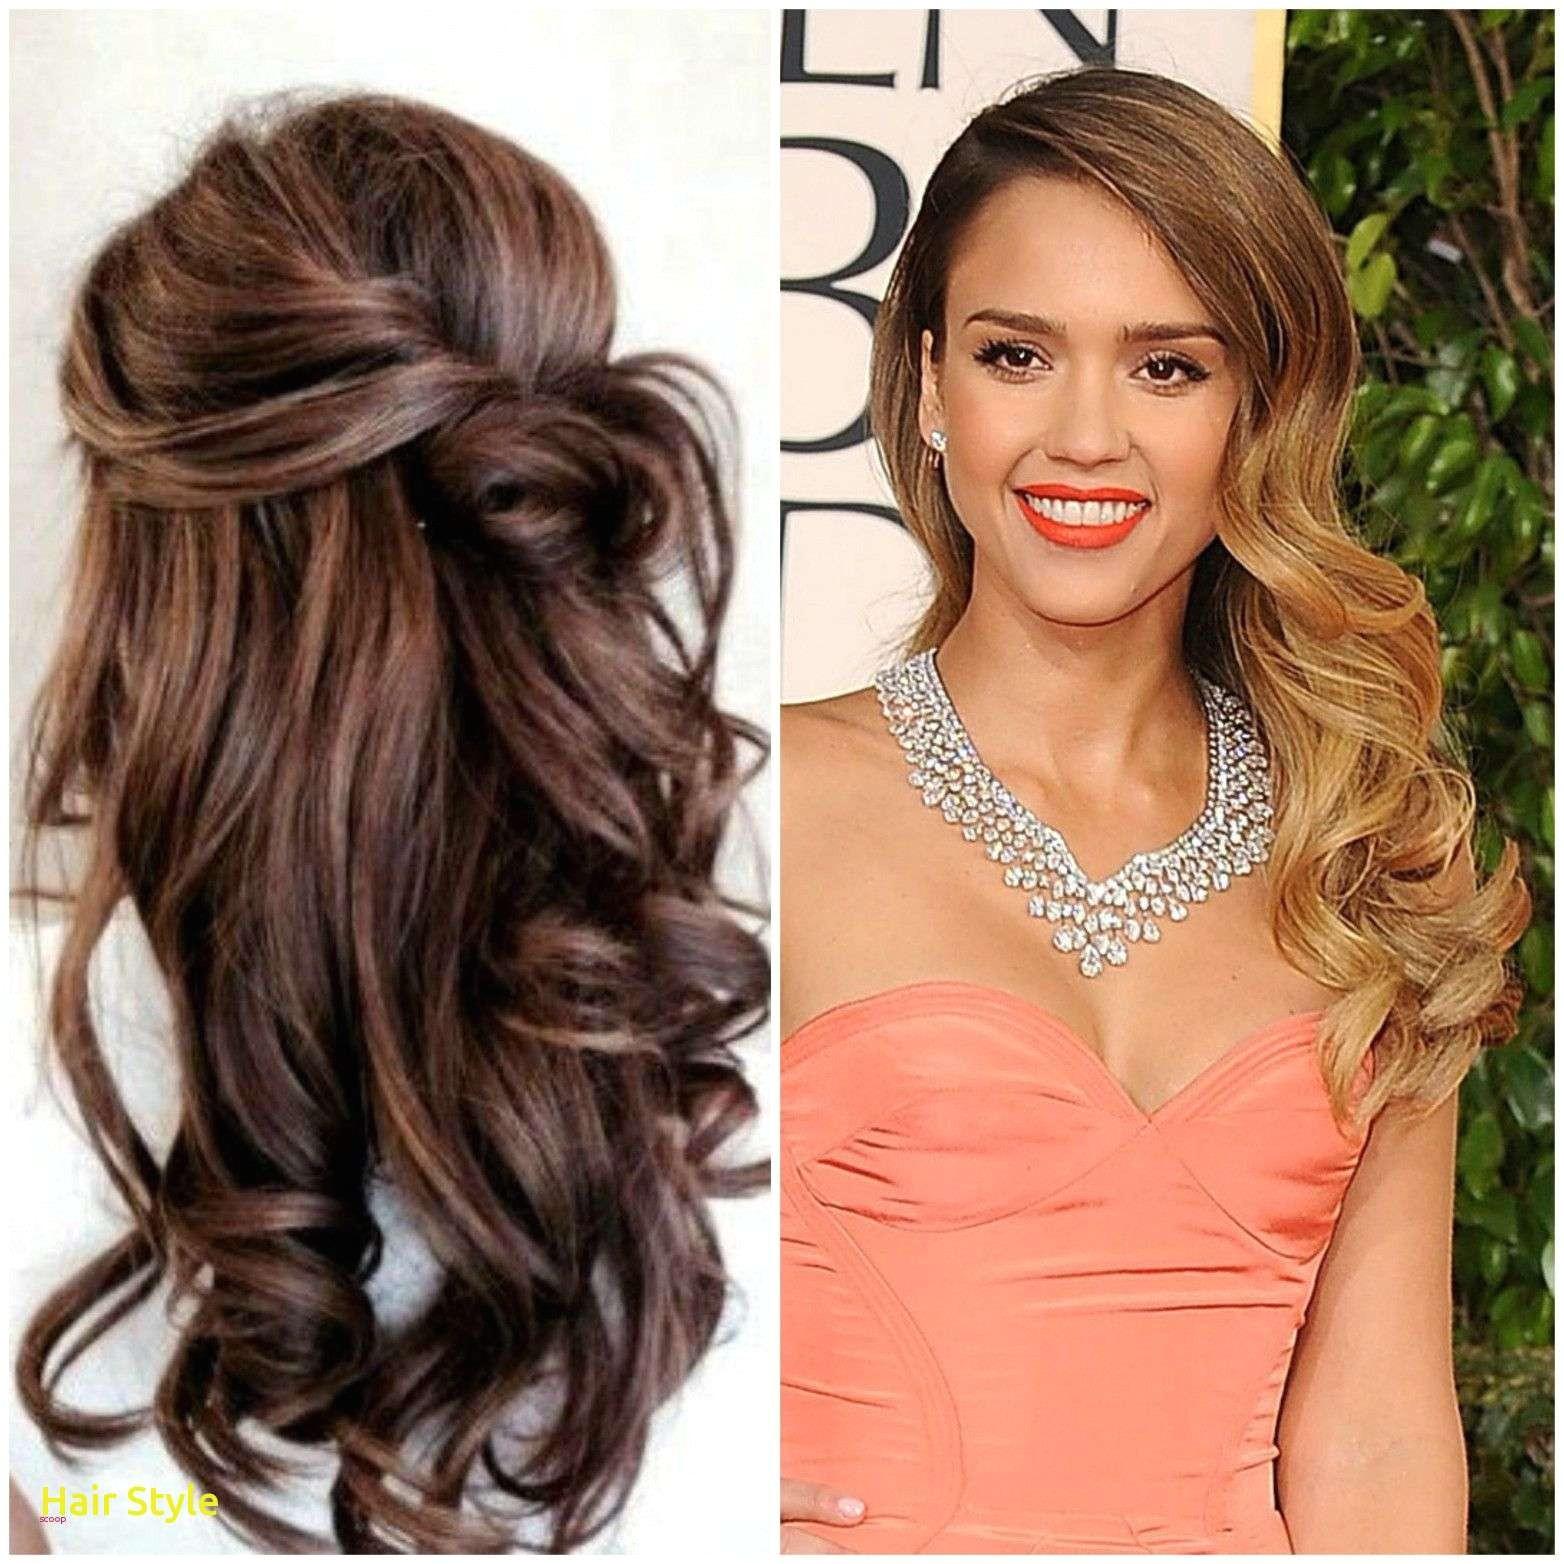 Hair Stylist Wedding Luxury New Short Wedding Hairstyles With Flowers – Uternity